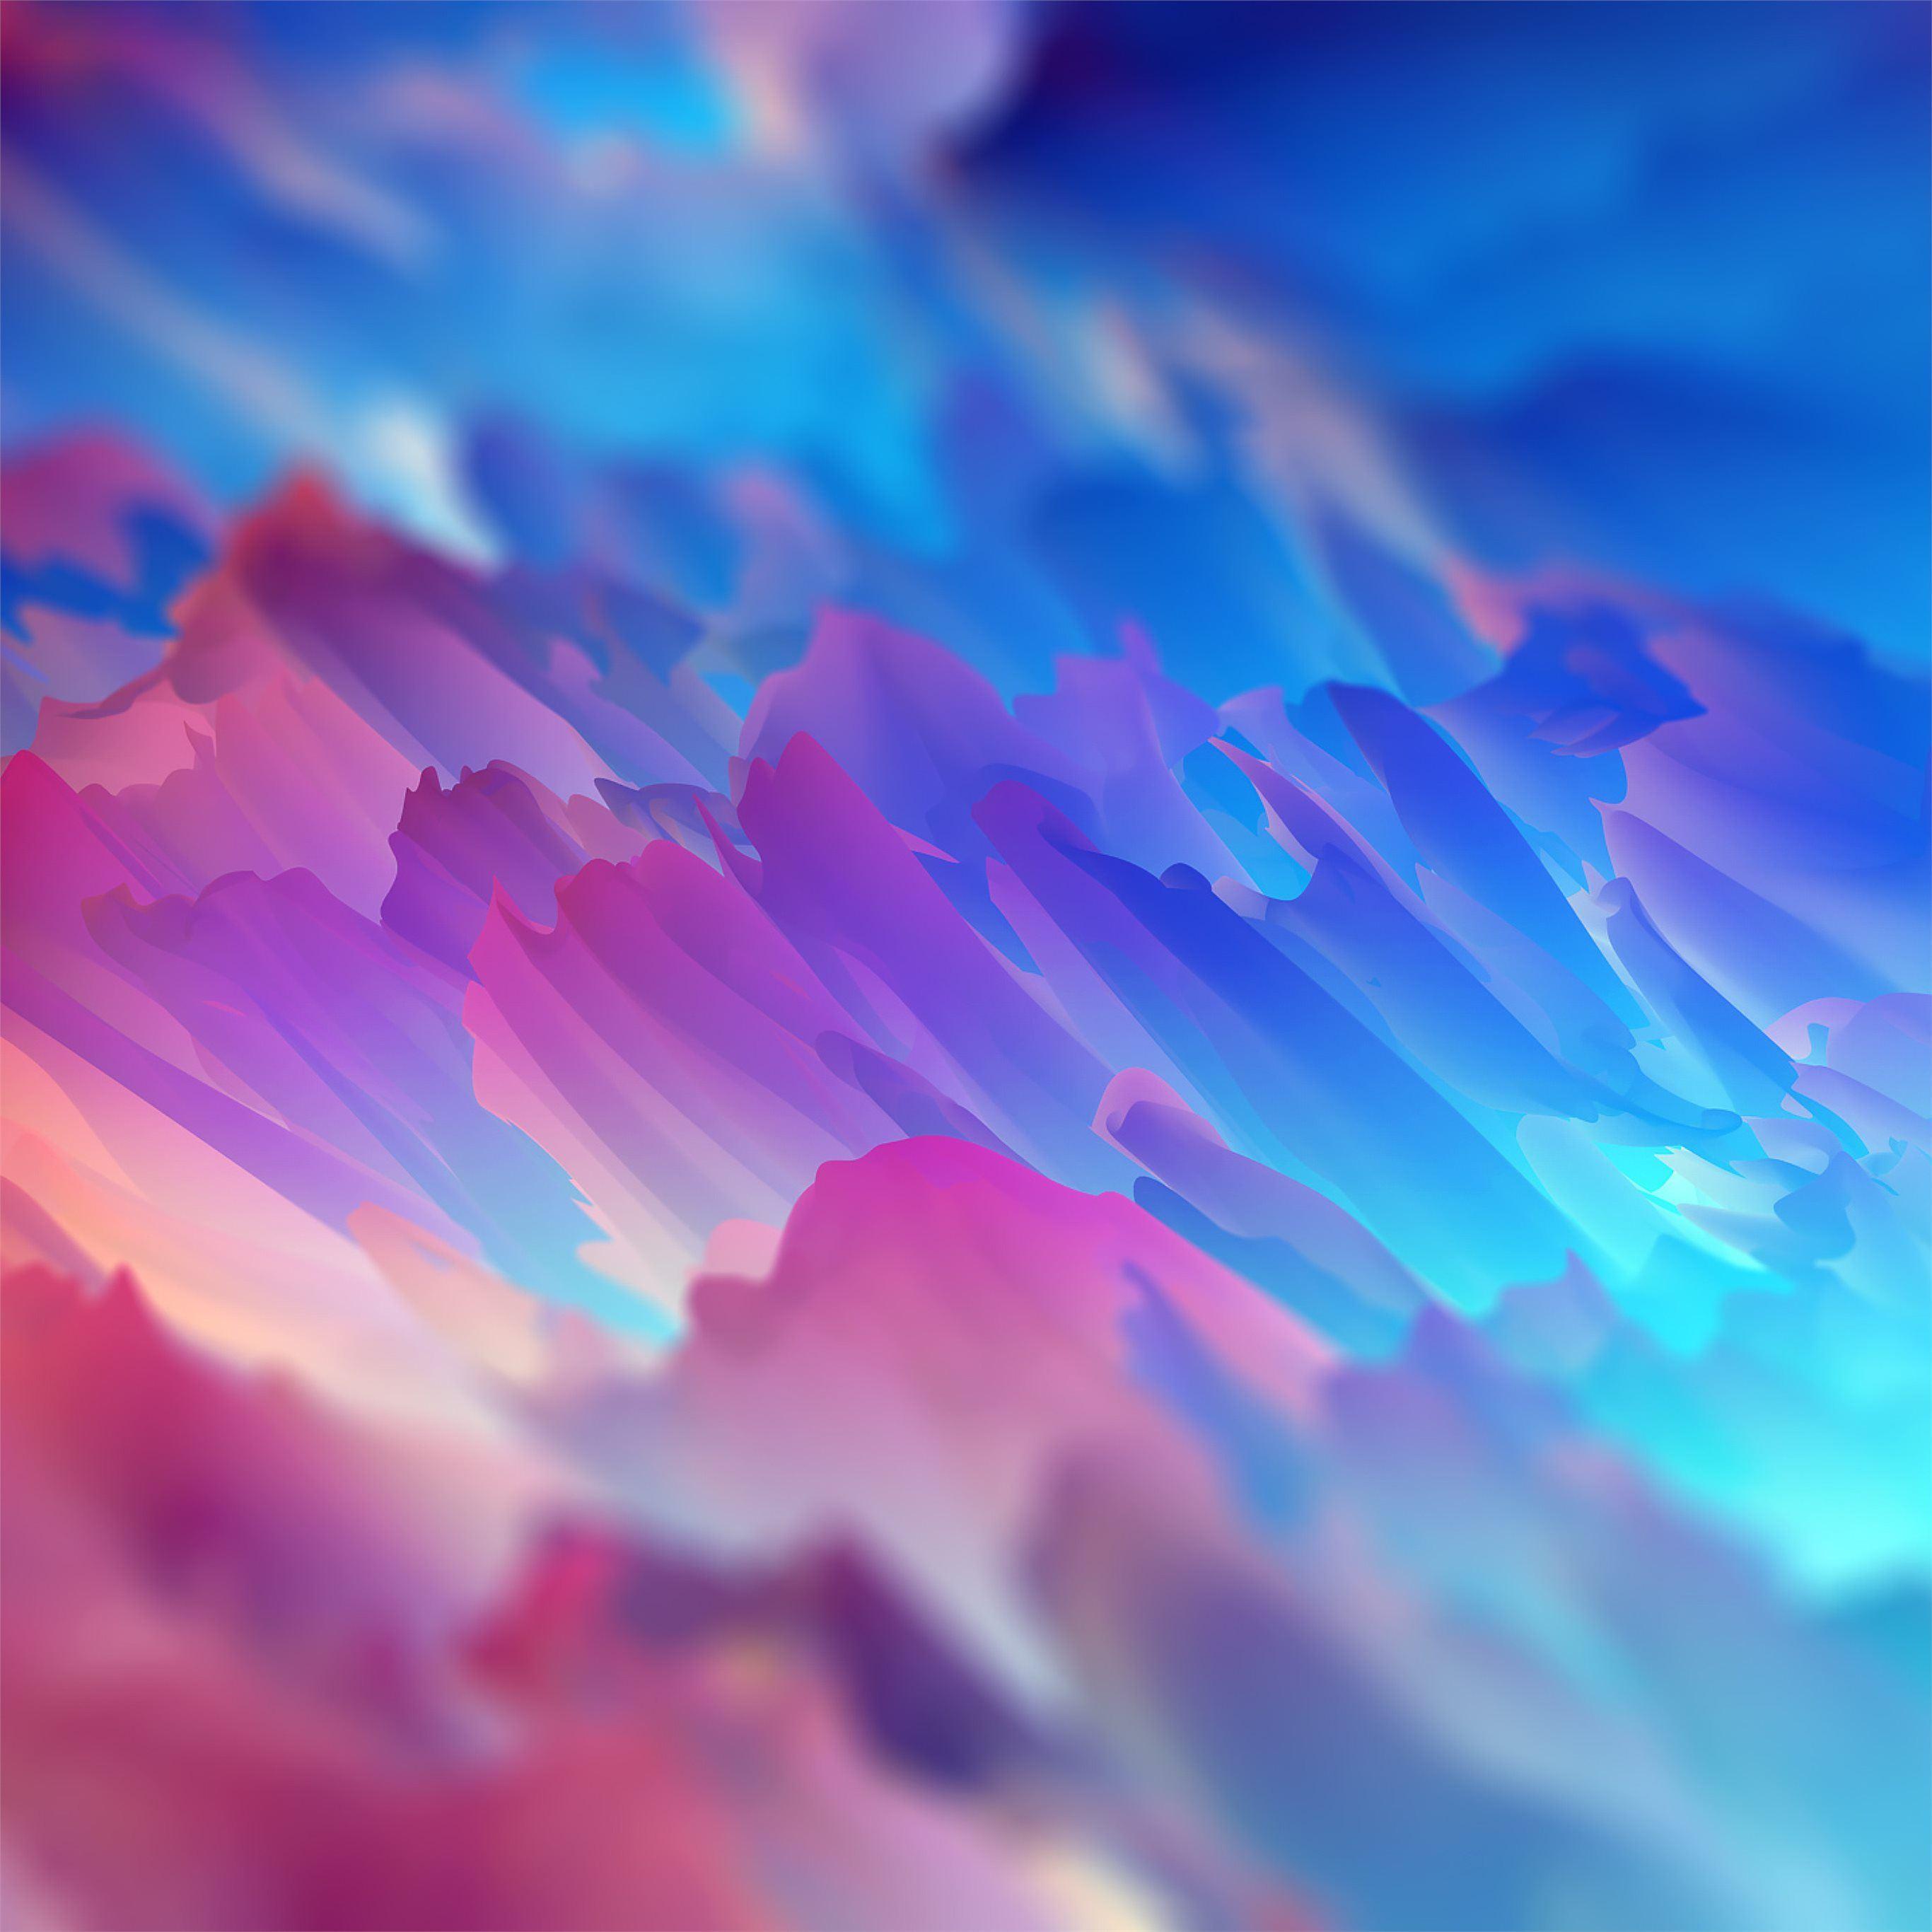 Best Abstract Ipad Pro Wallpapers Hd Ilikewallpaper